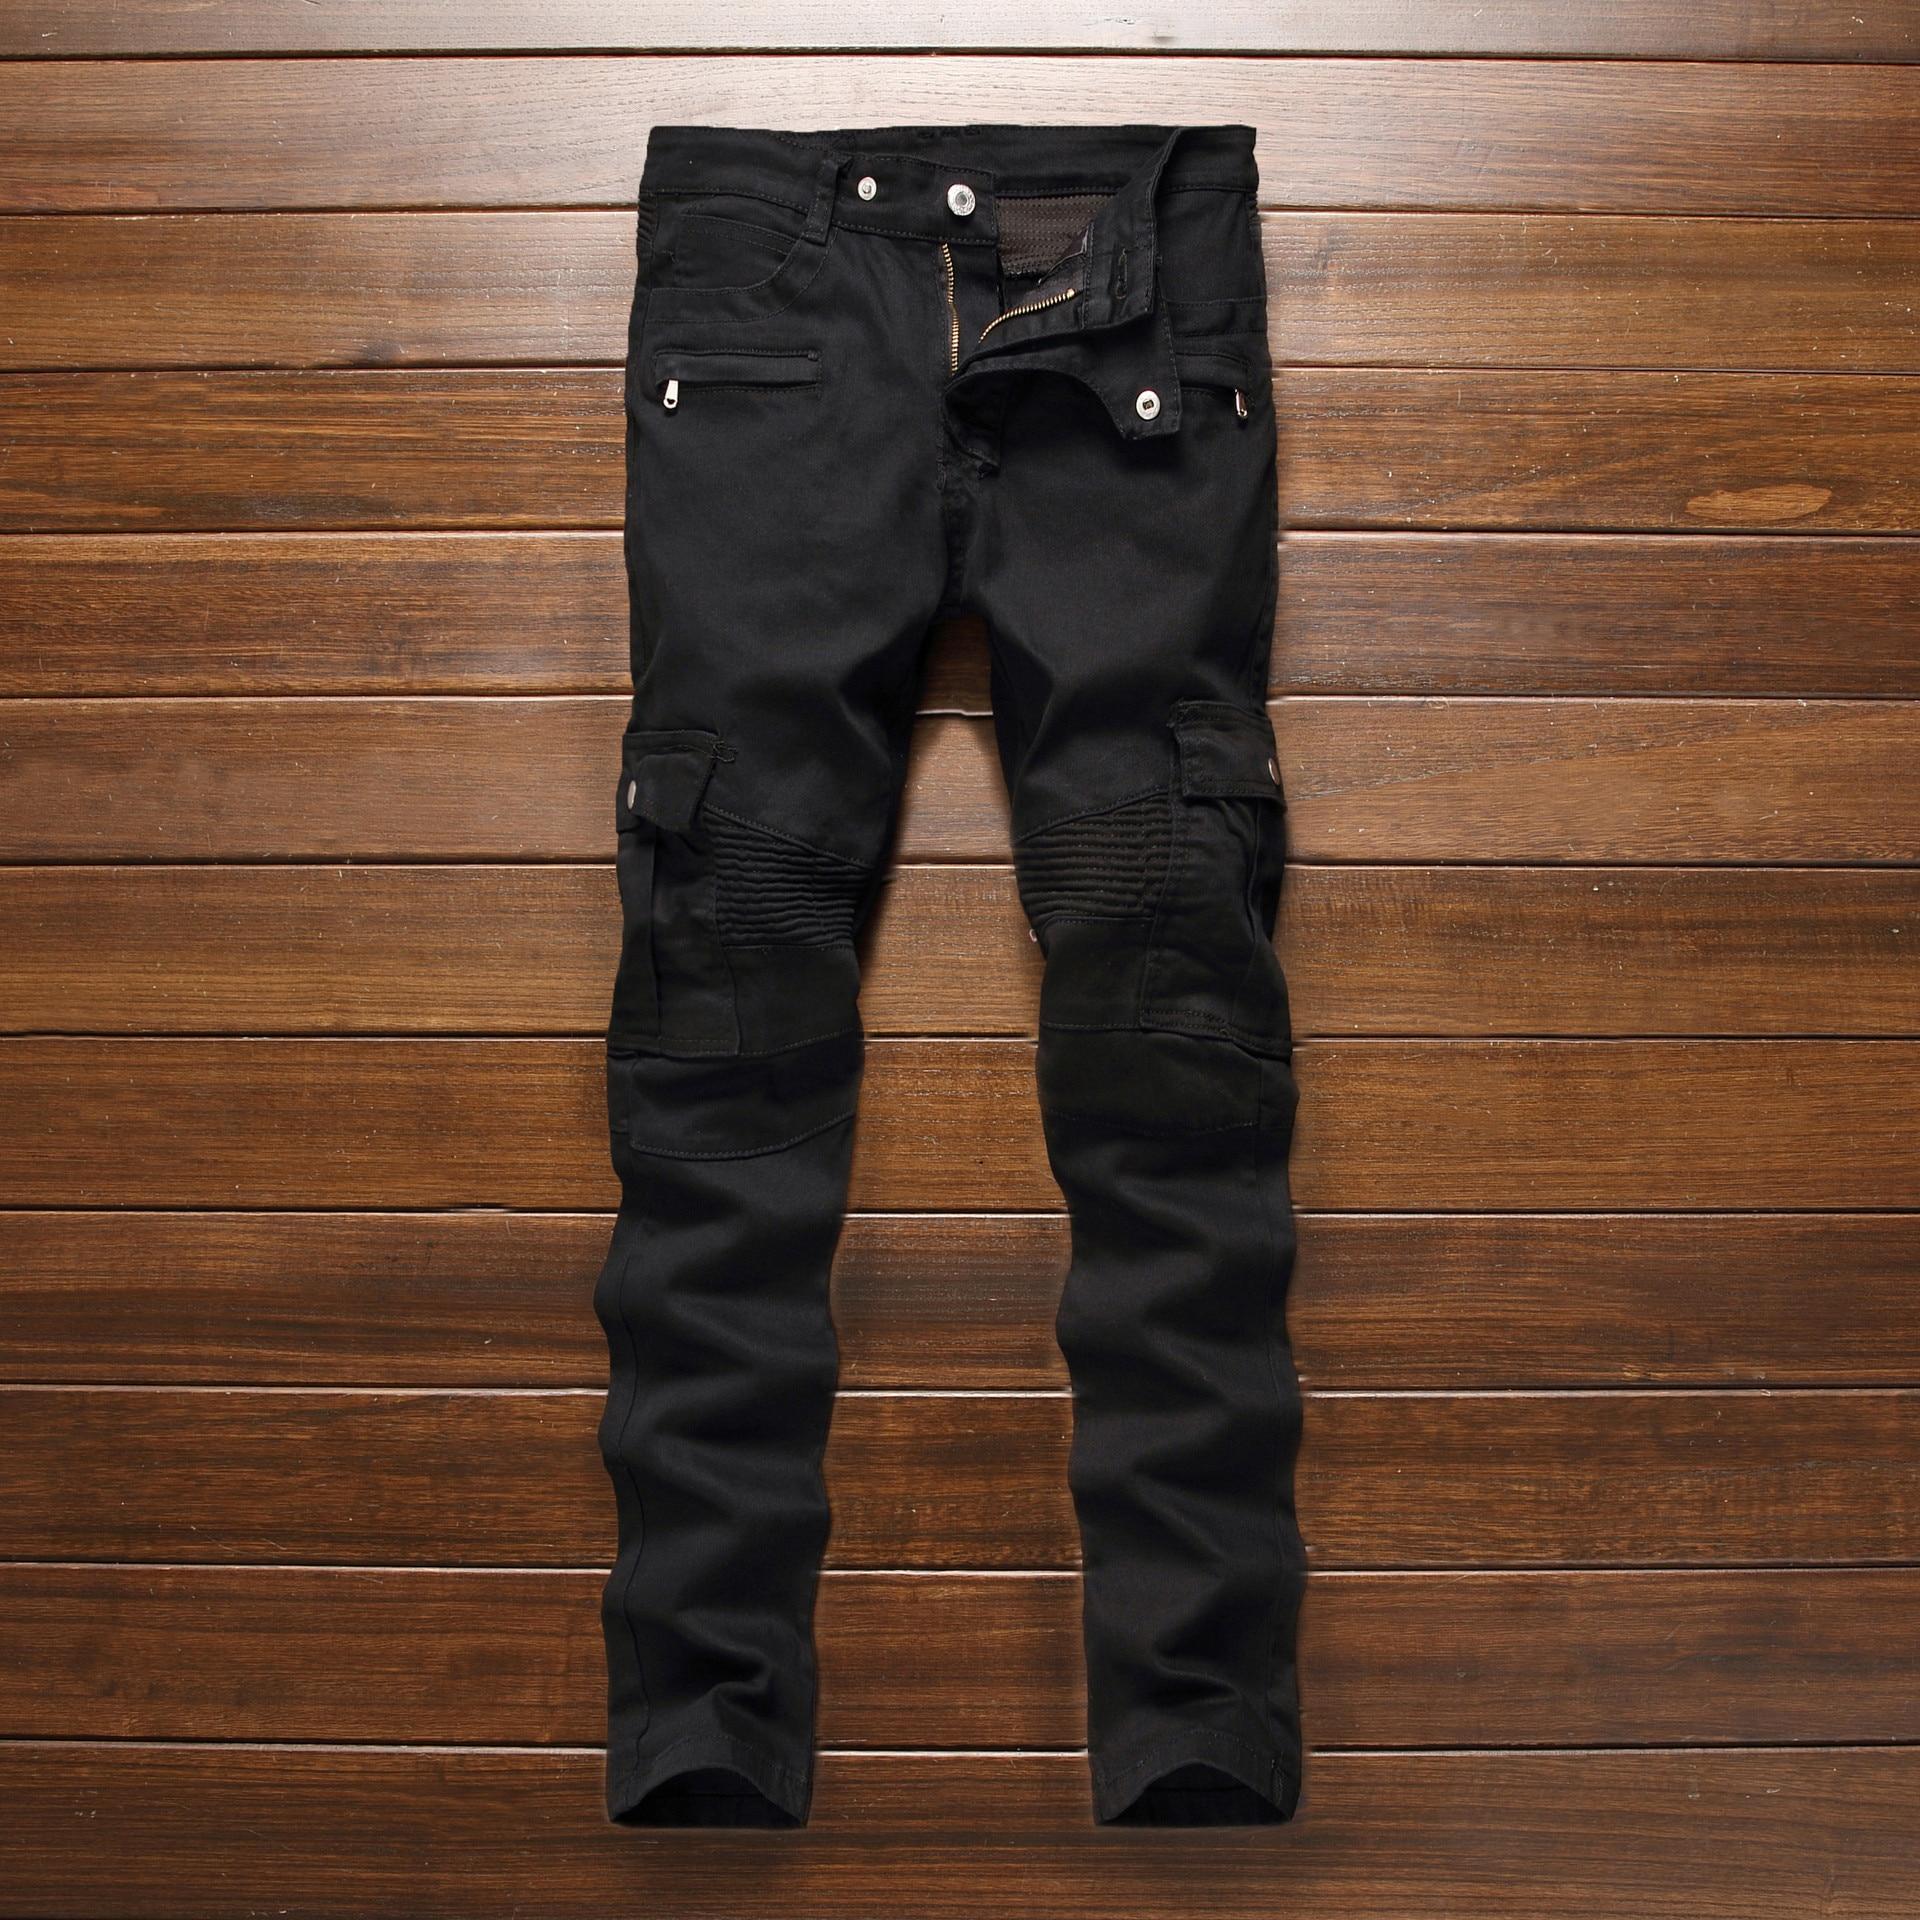 ФОТО Fashion Men's Designer Pattern Black Jeans Men Casual Straight Slim Fit Biker Jeans Denim Pants 5009